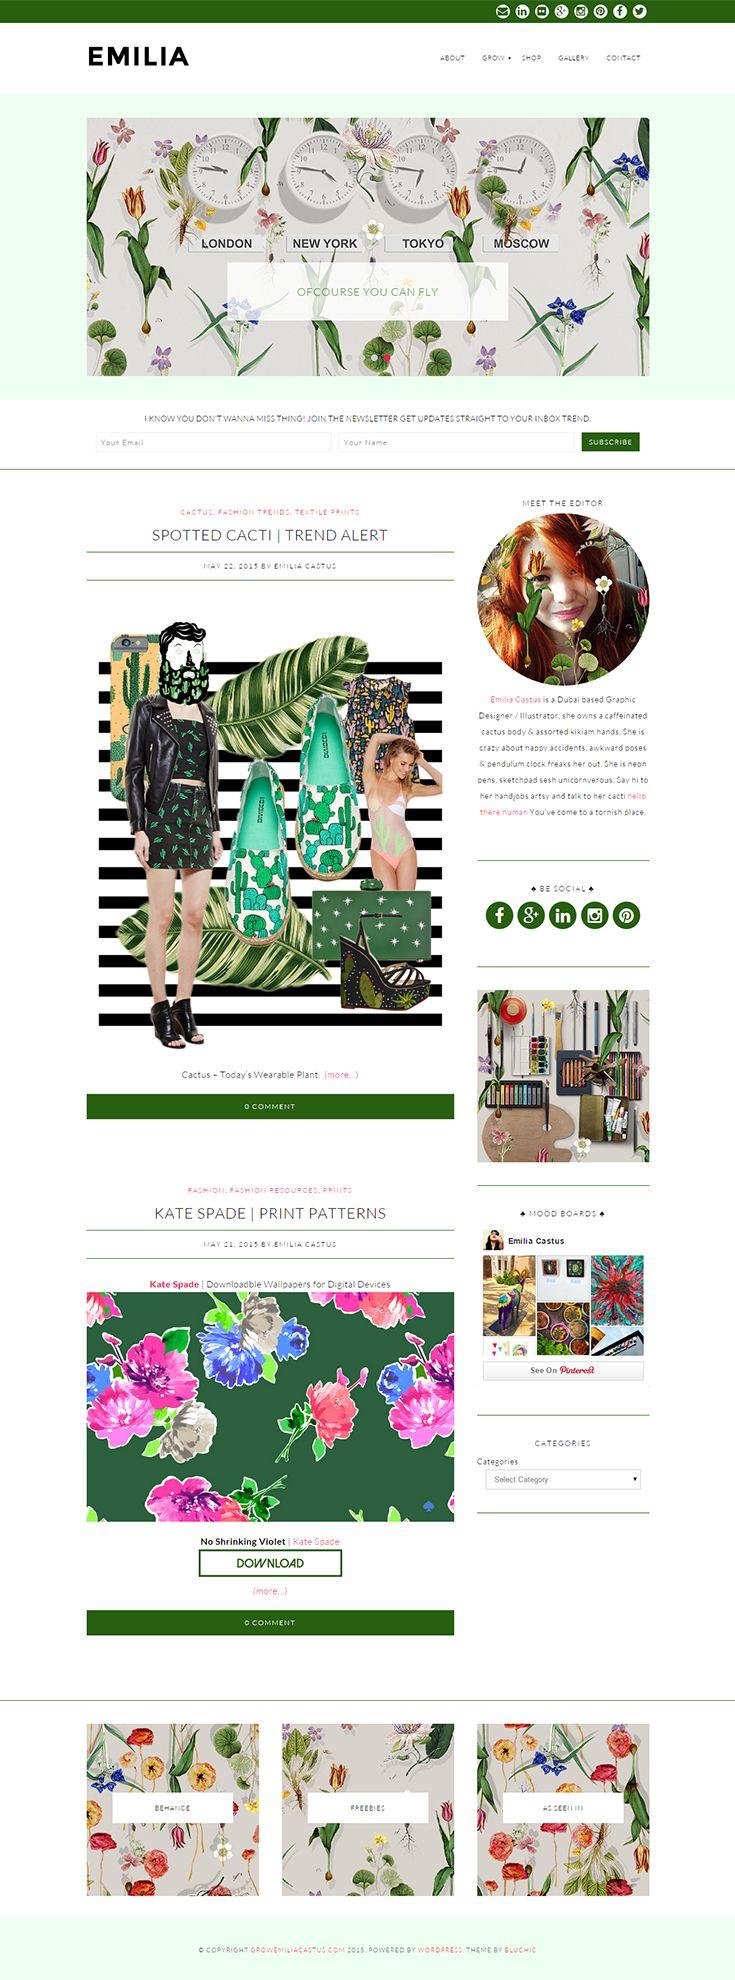 Chic blog design, using OLIVIE WordPress Theme from Bluchic http://www.bluchic.com/shop/wordpress-themes/olivie-theme/